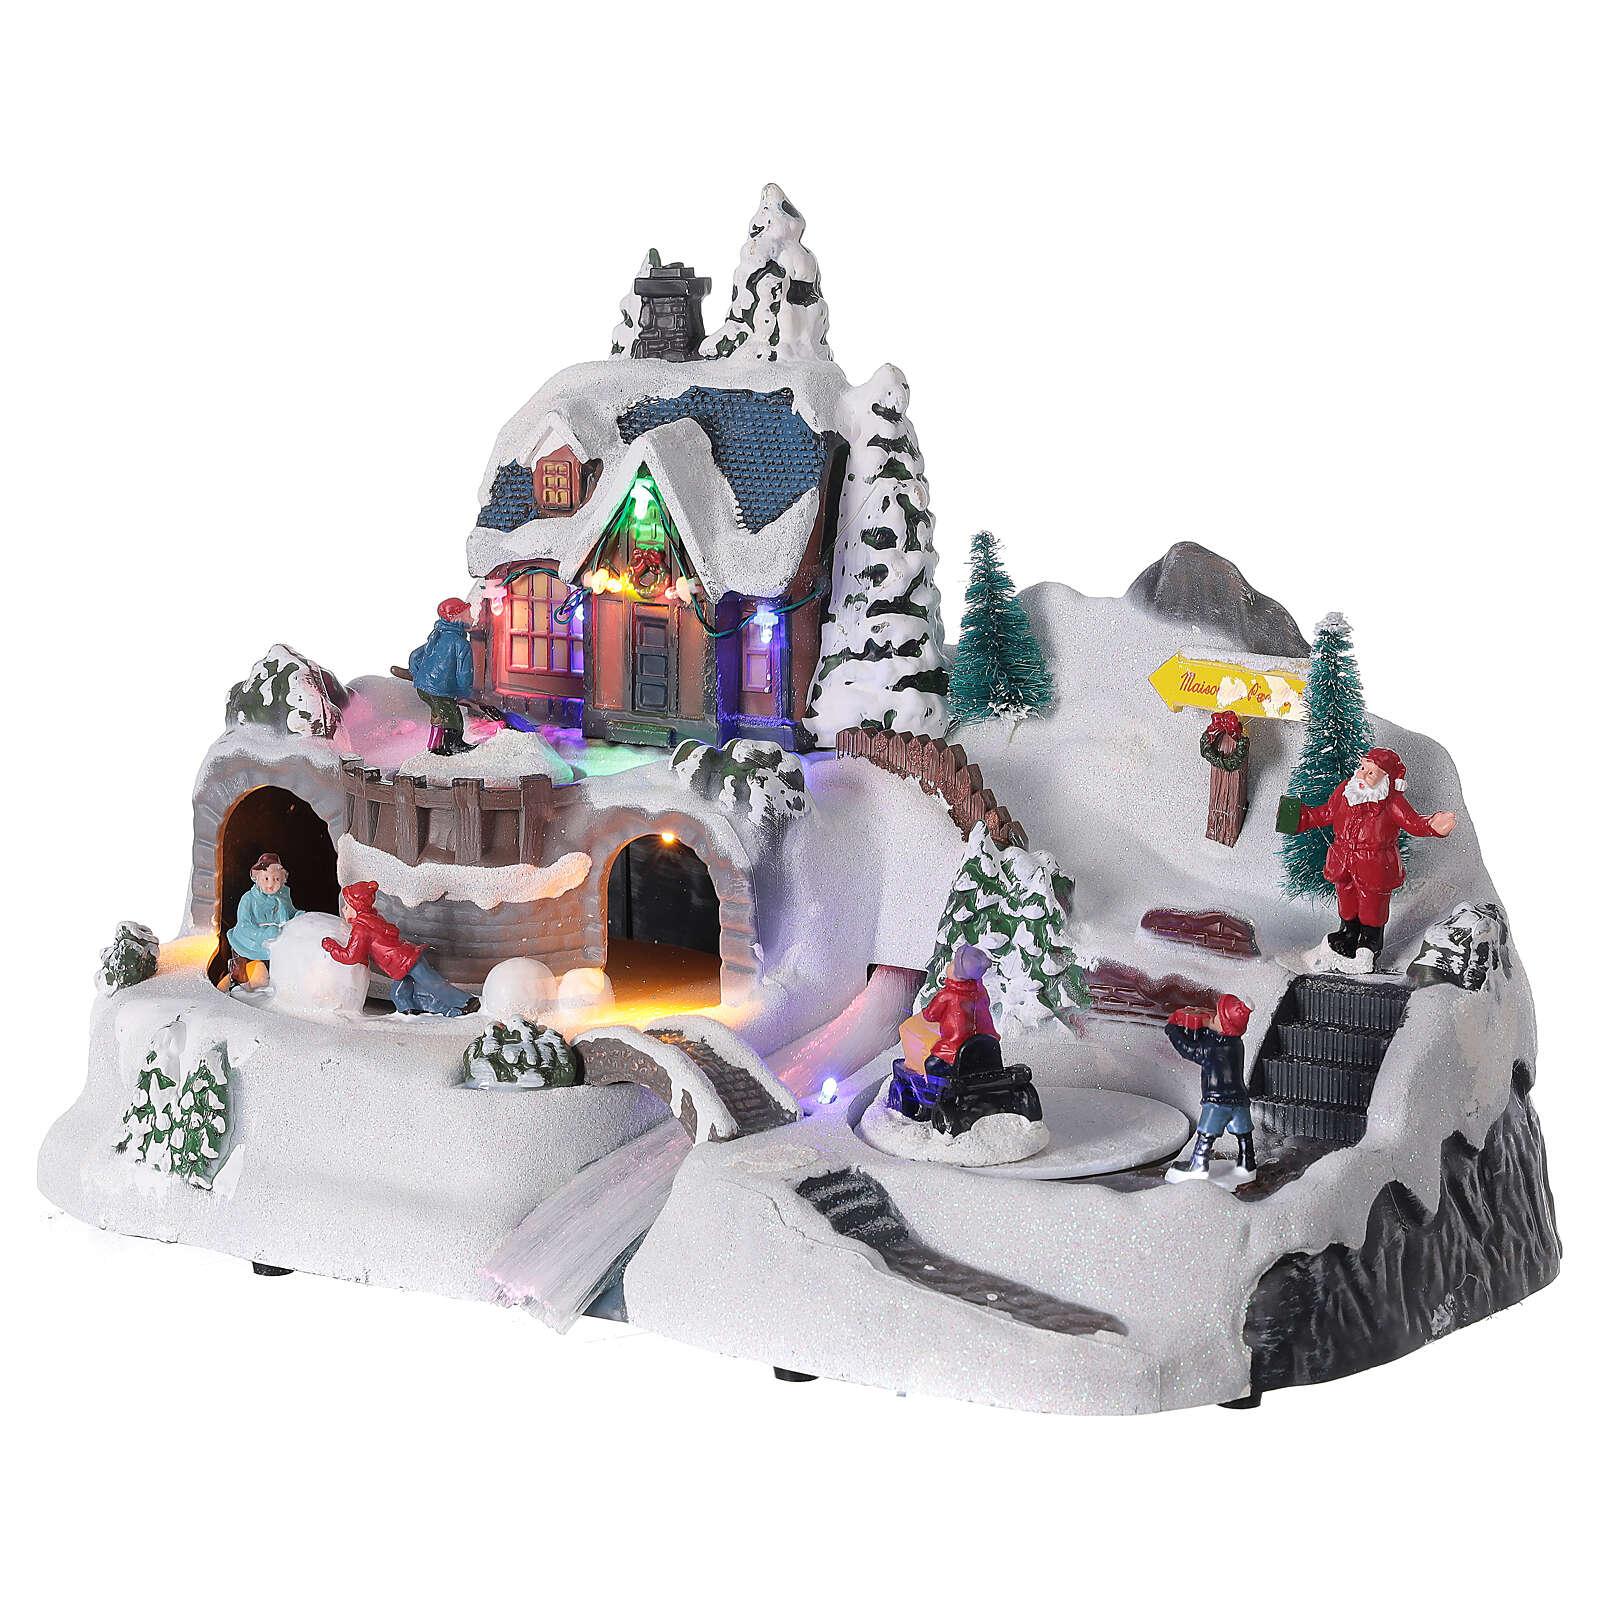 Snowy Christmas village deer LED lights music 25x40x20 cm 3